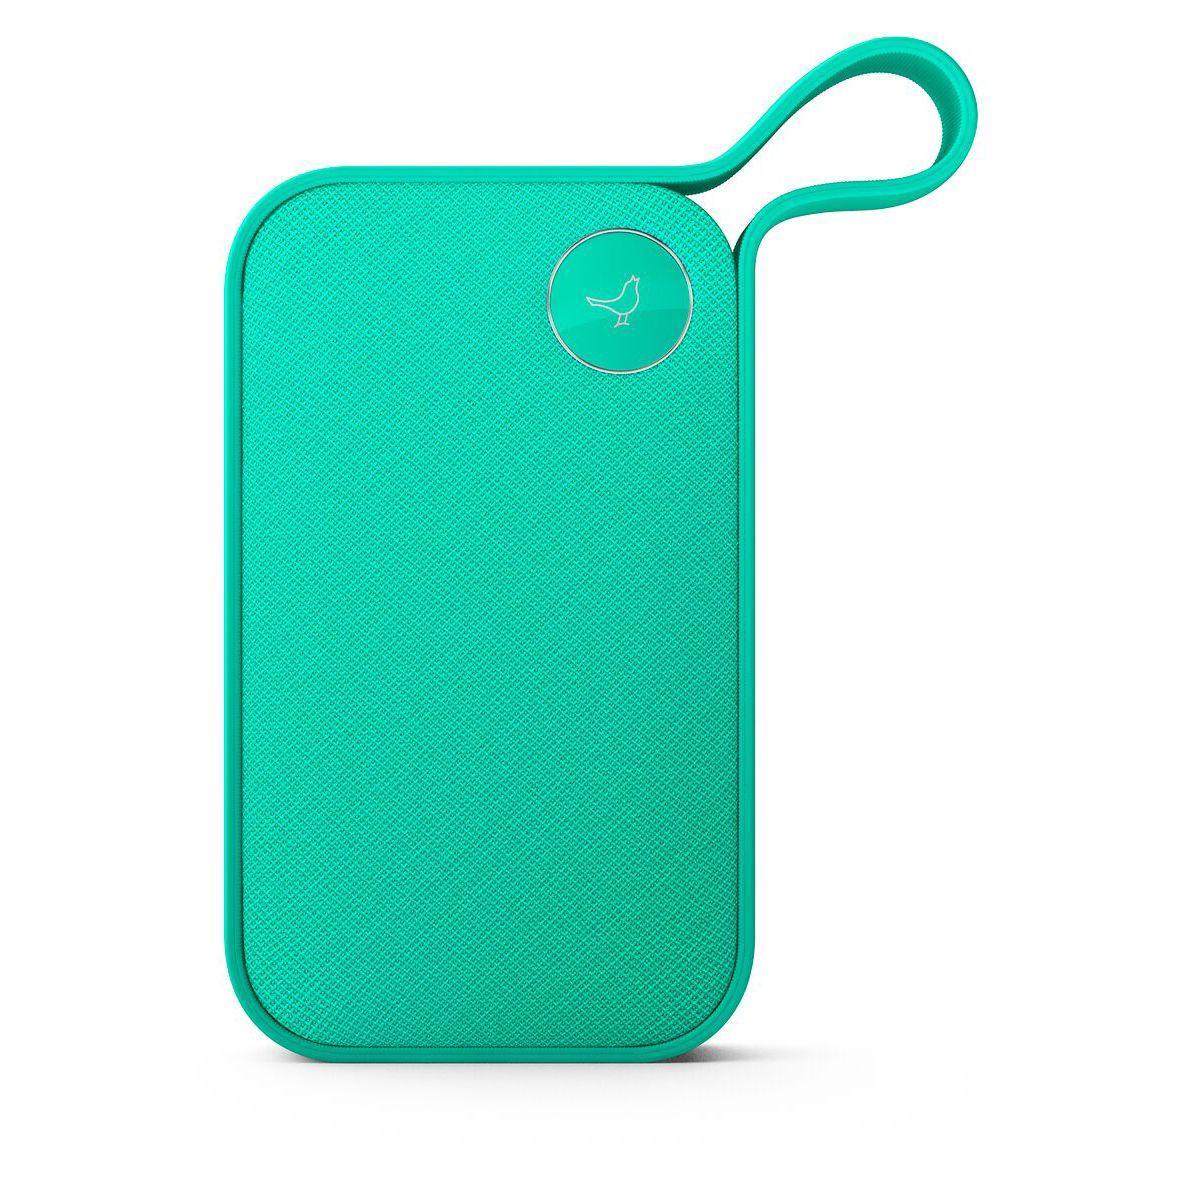 Enceinte libratone one style vert cara�b - 20% de remise imm�diate avec le code : green20